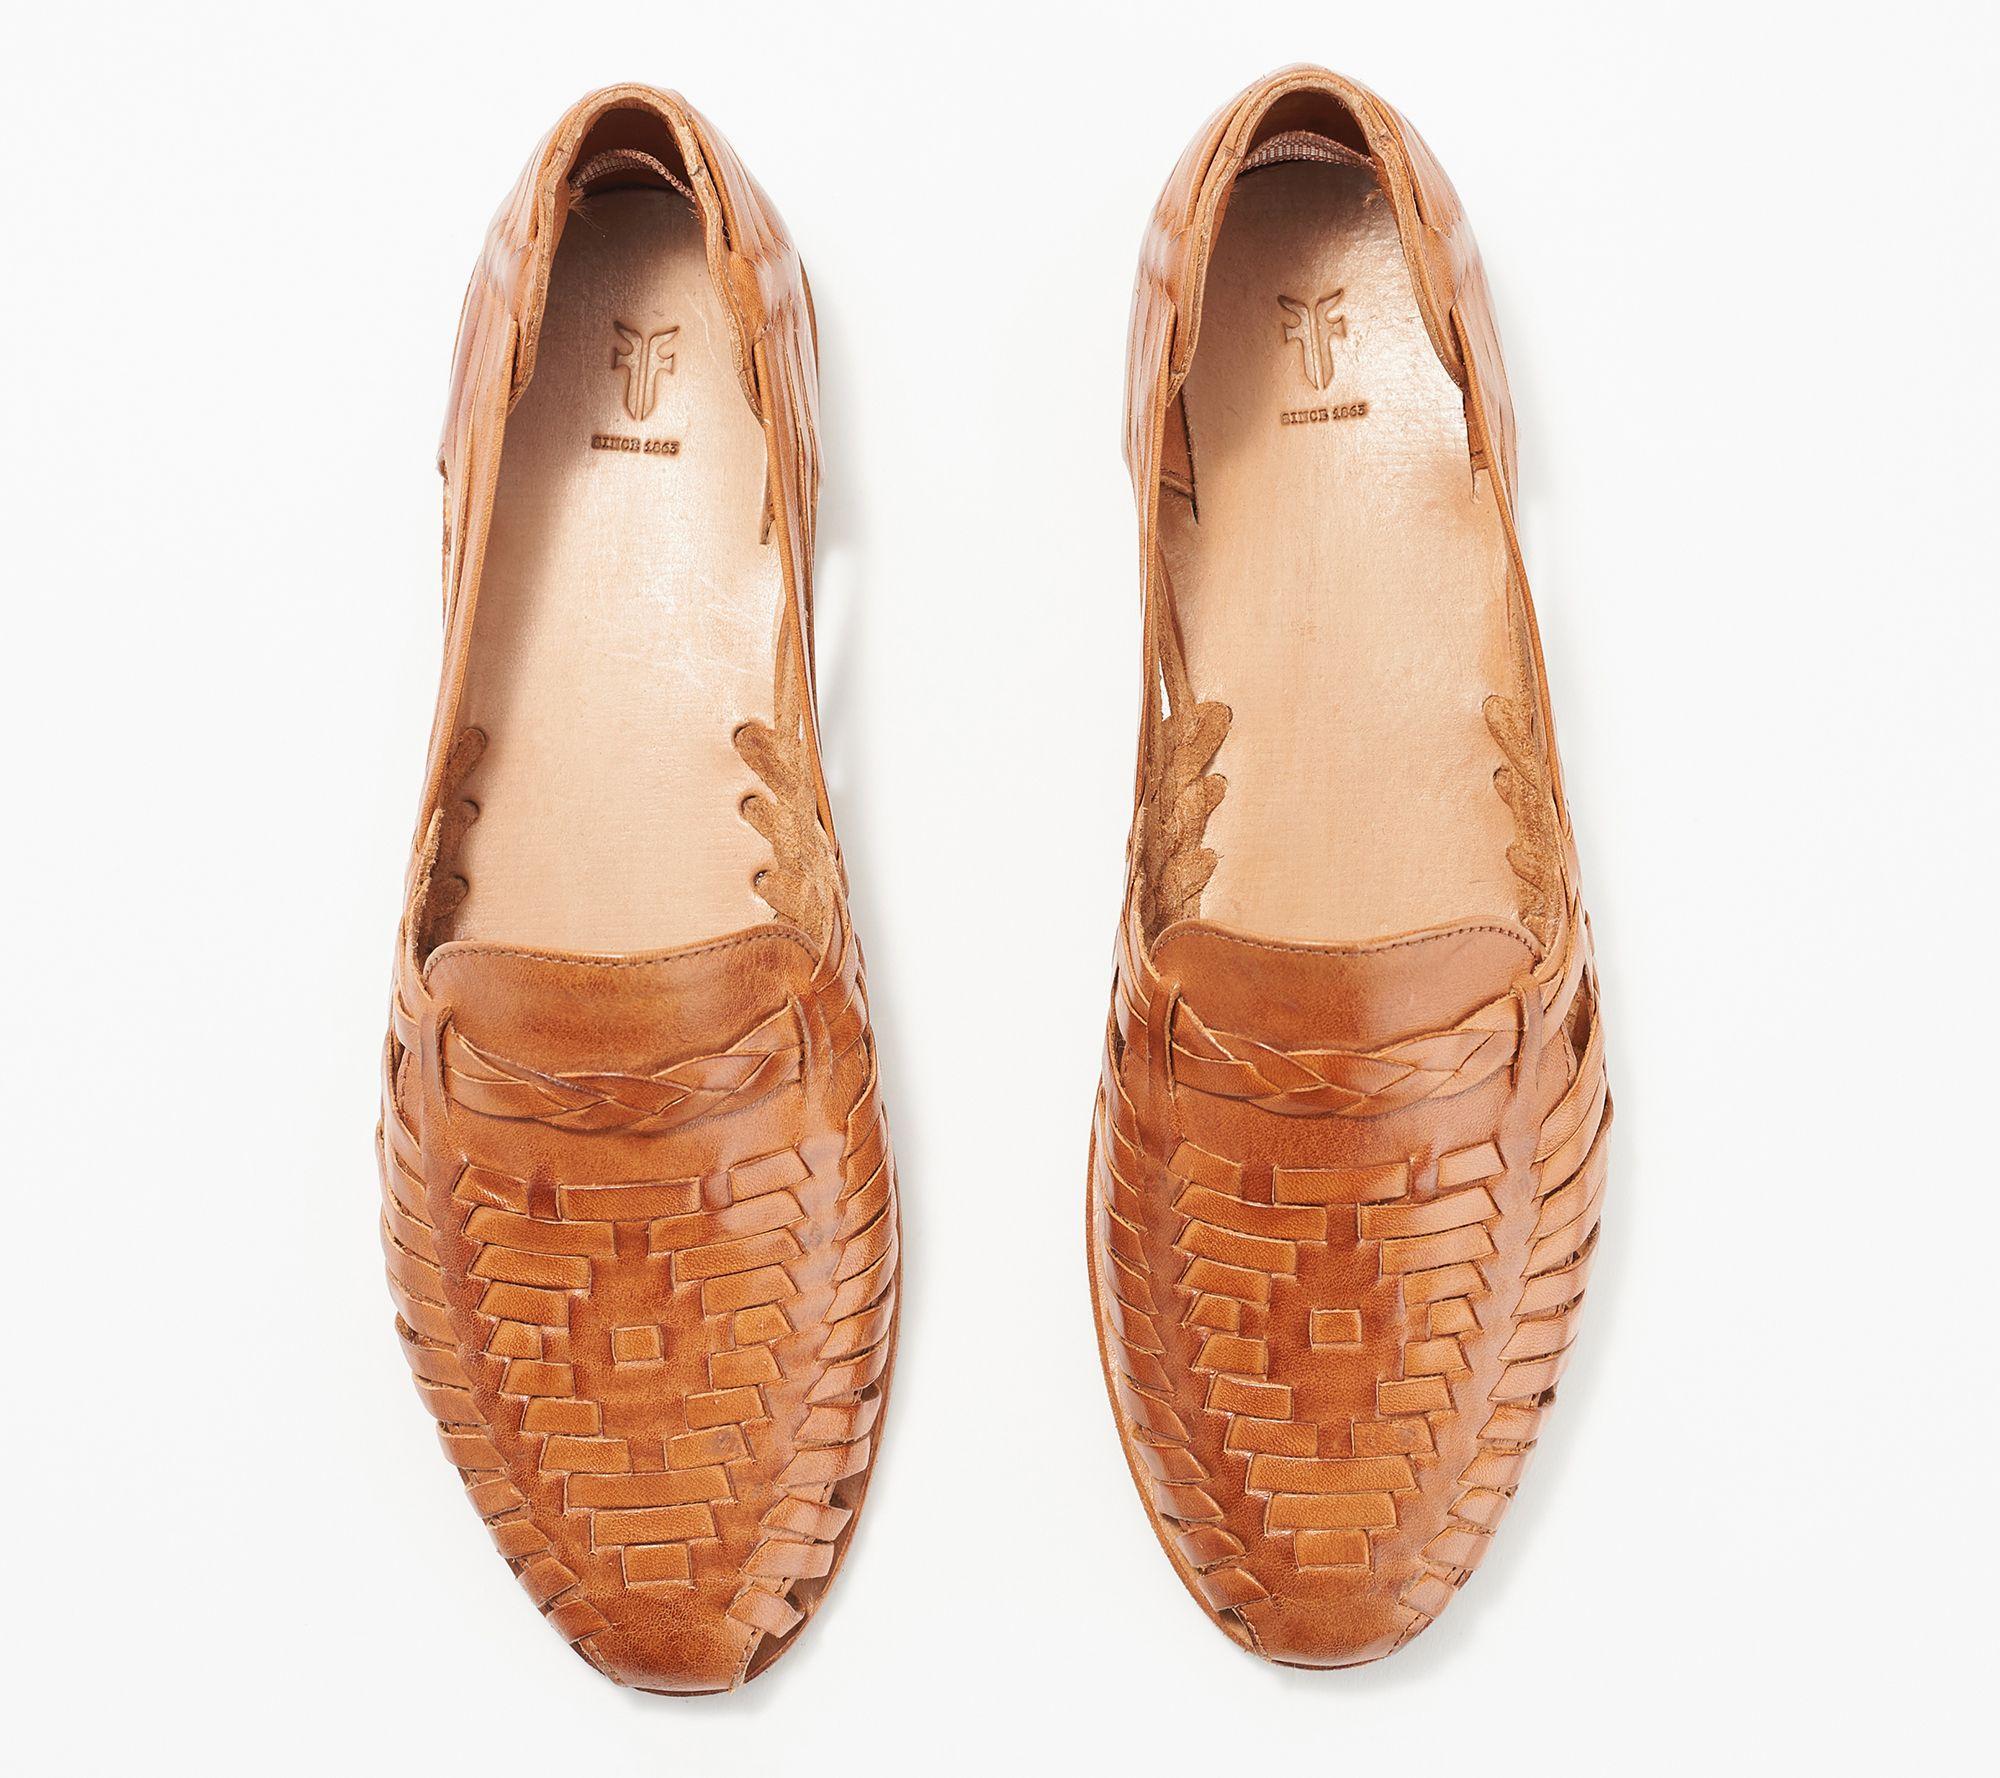 Frye Leather Slip-On Sandals - Heather Huarache - QVC.com